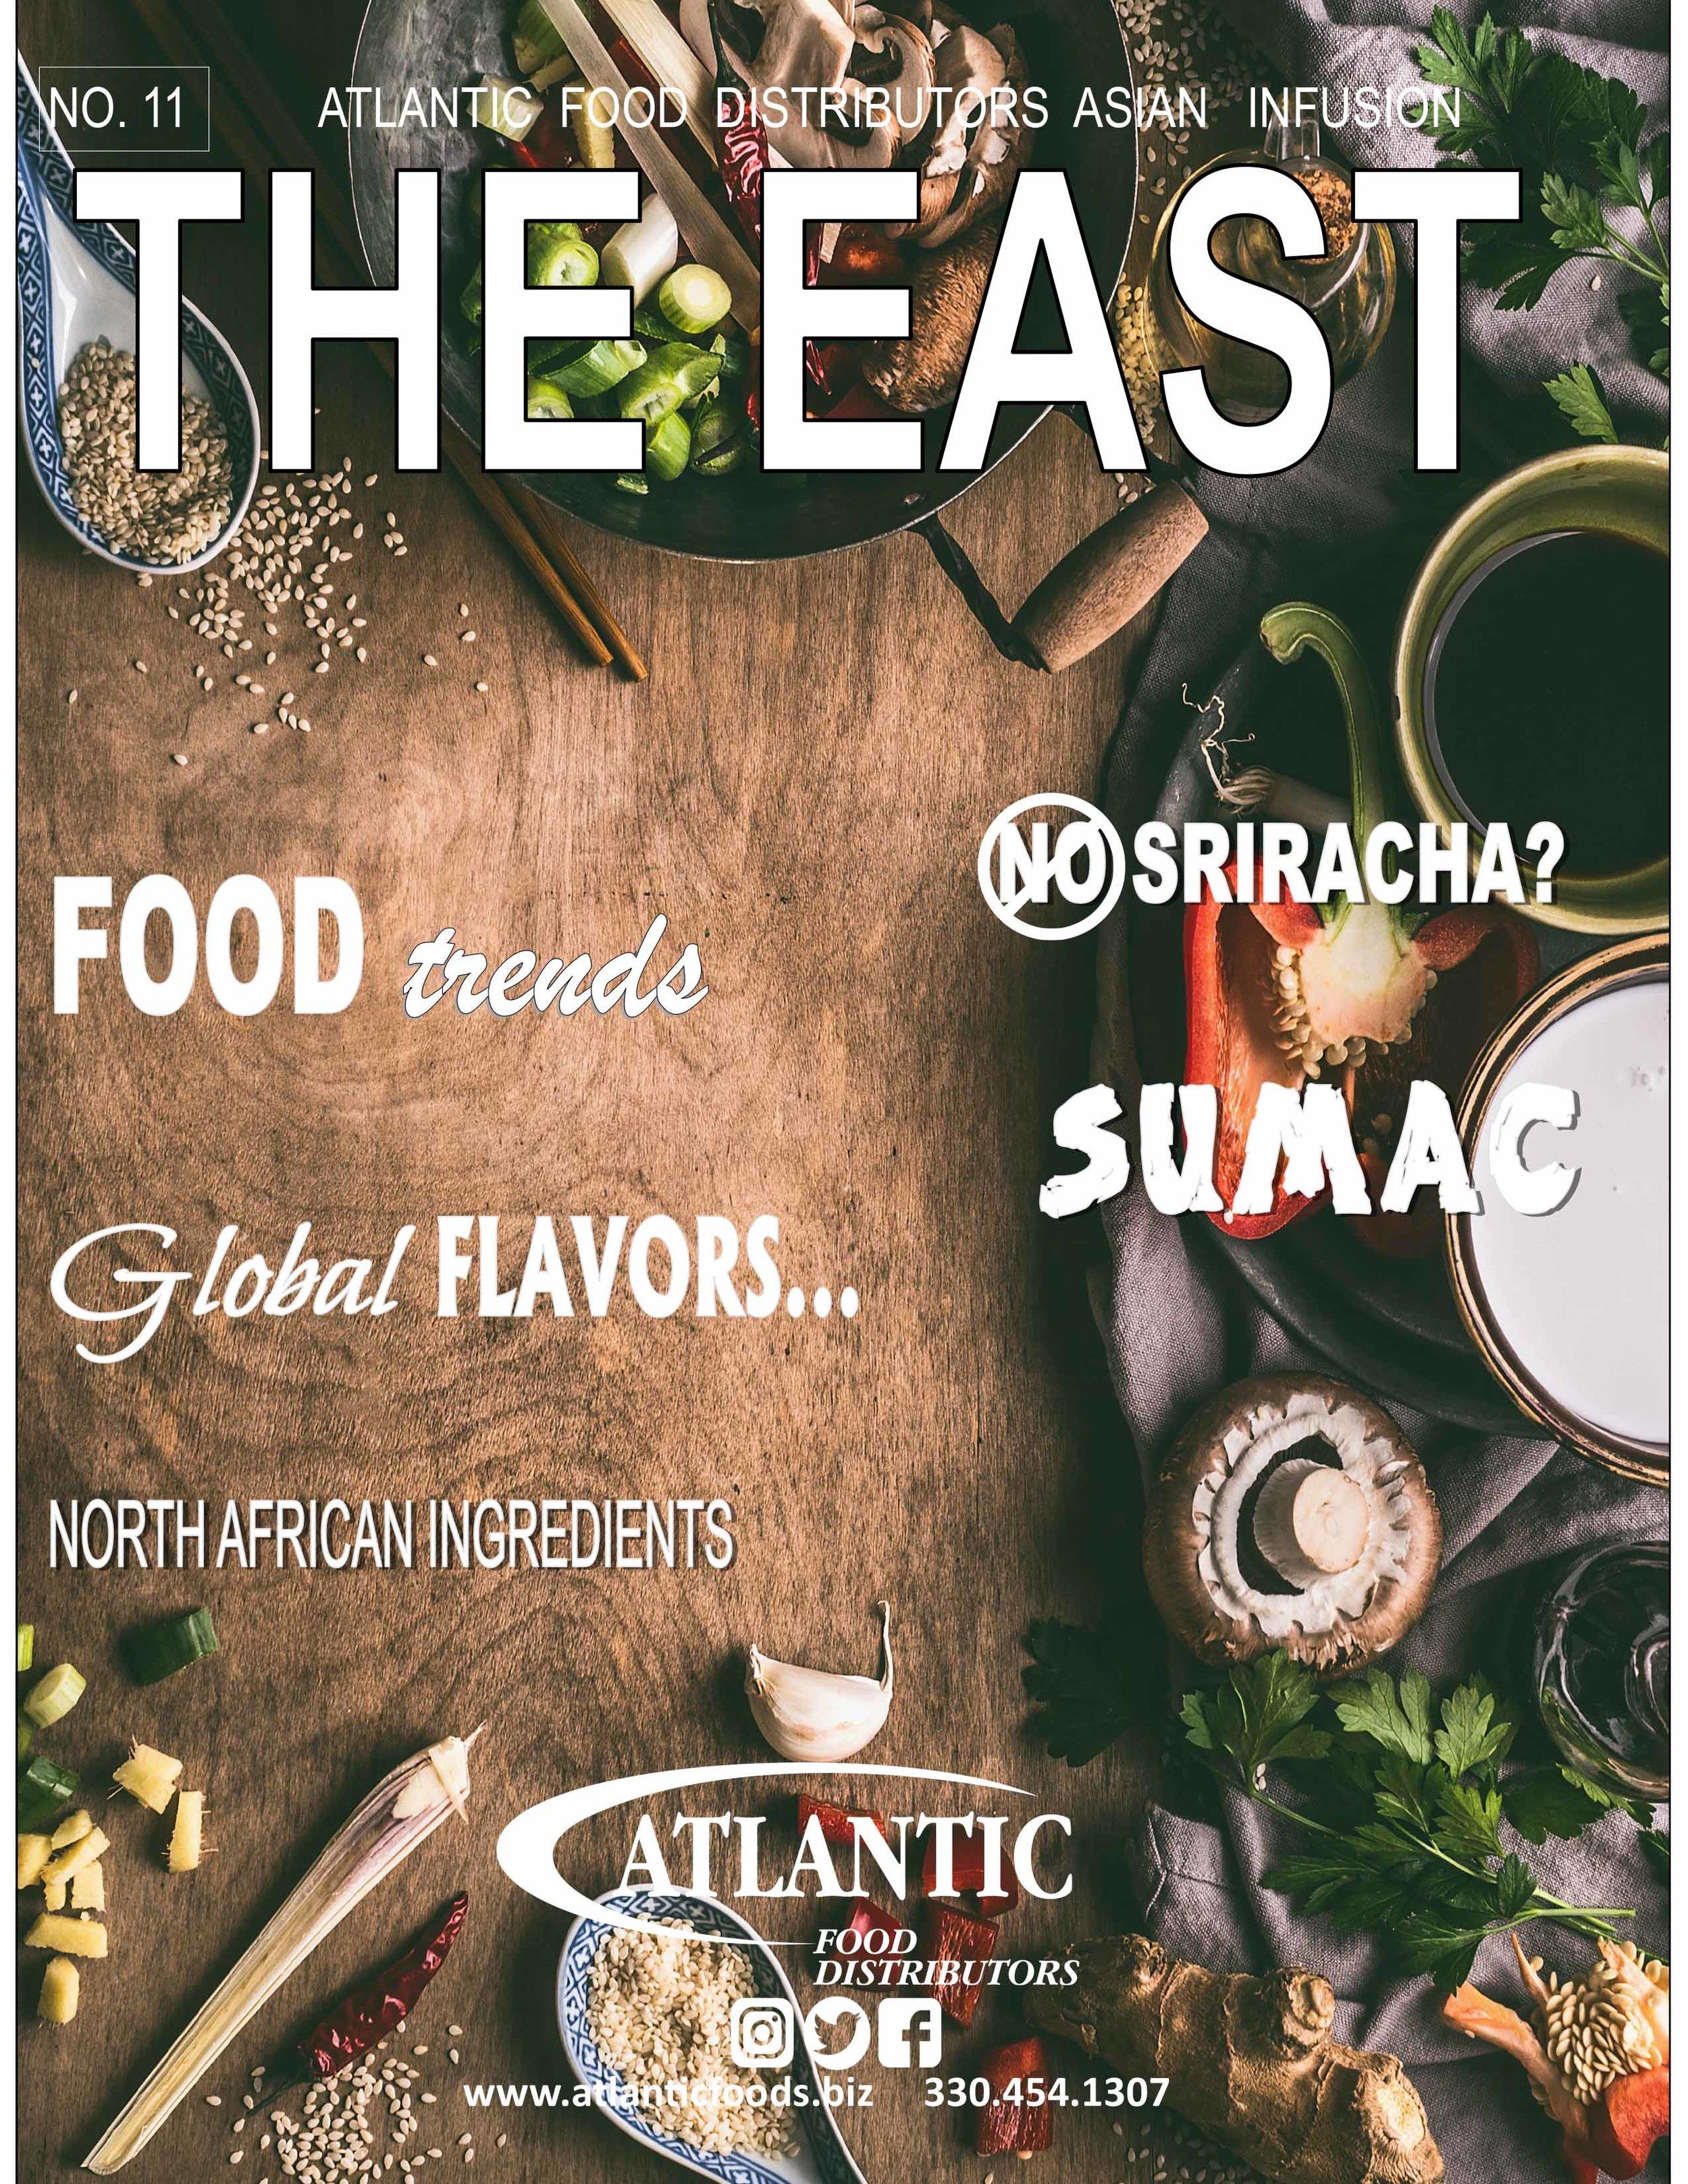 Atlantic Food Distributors - Home